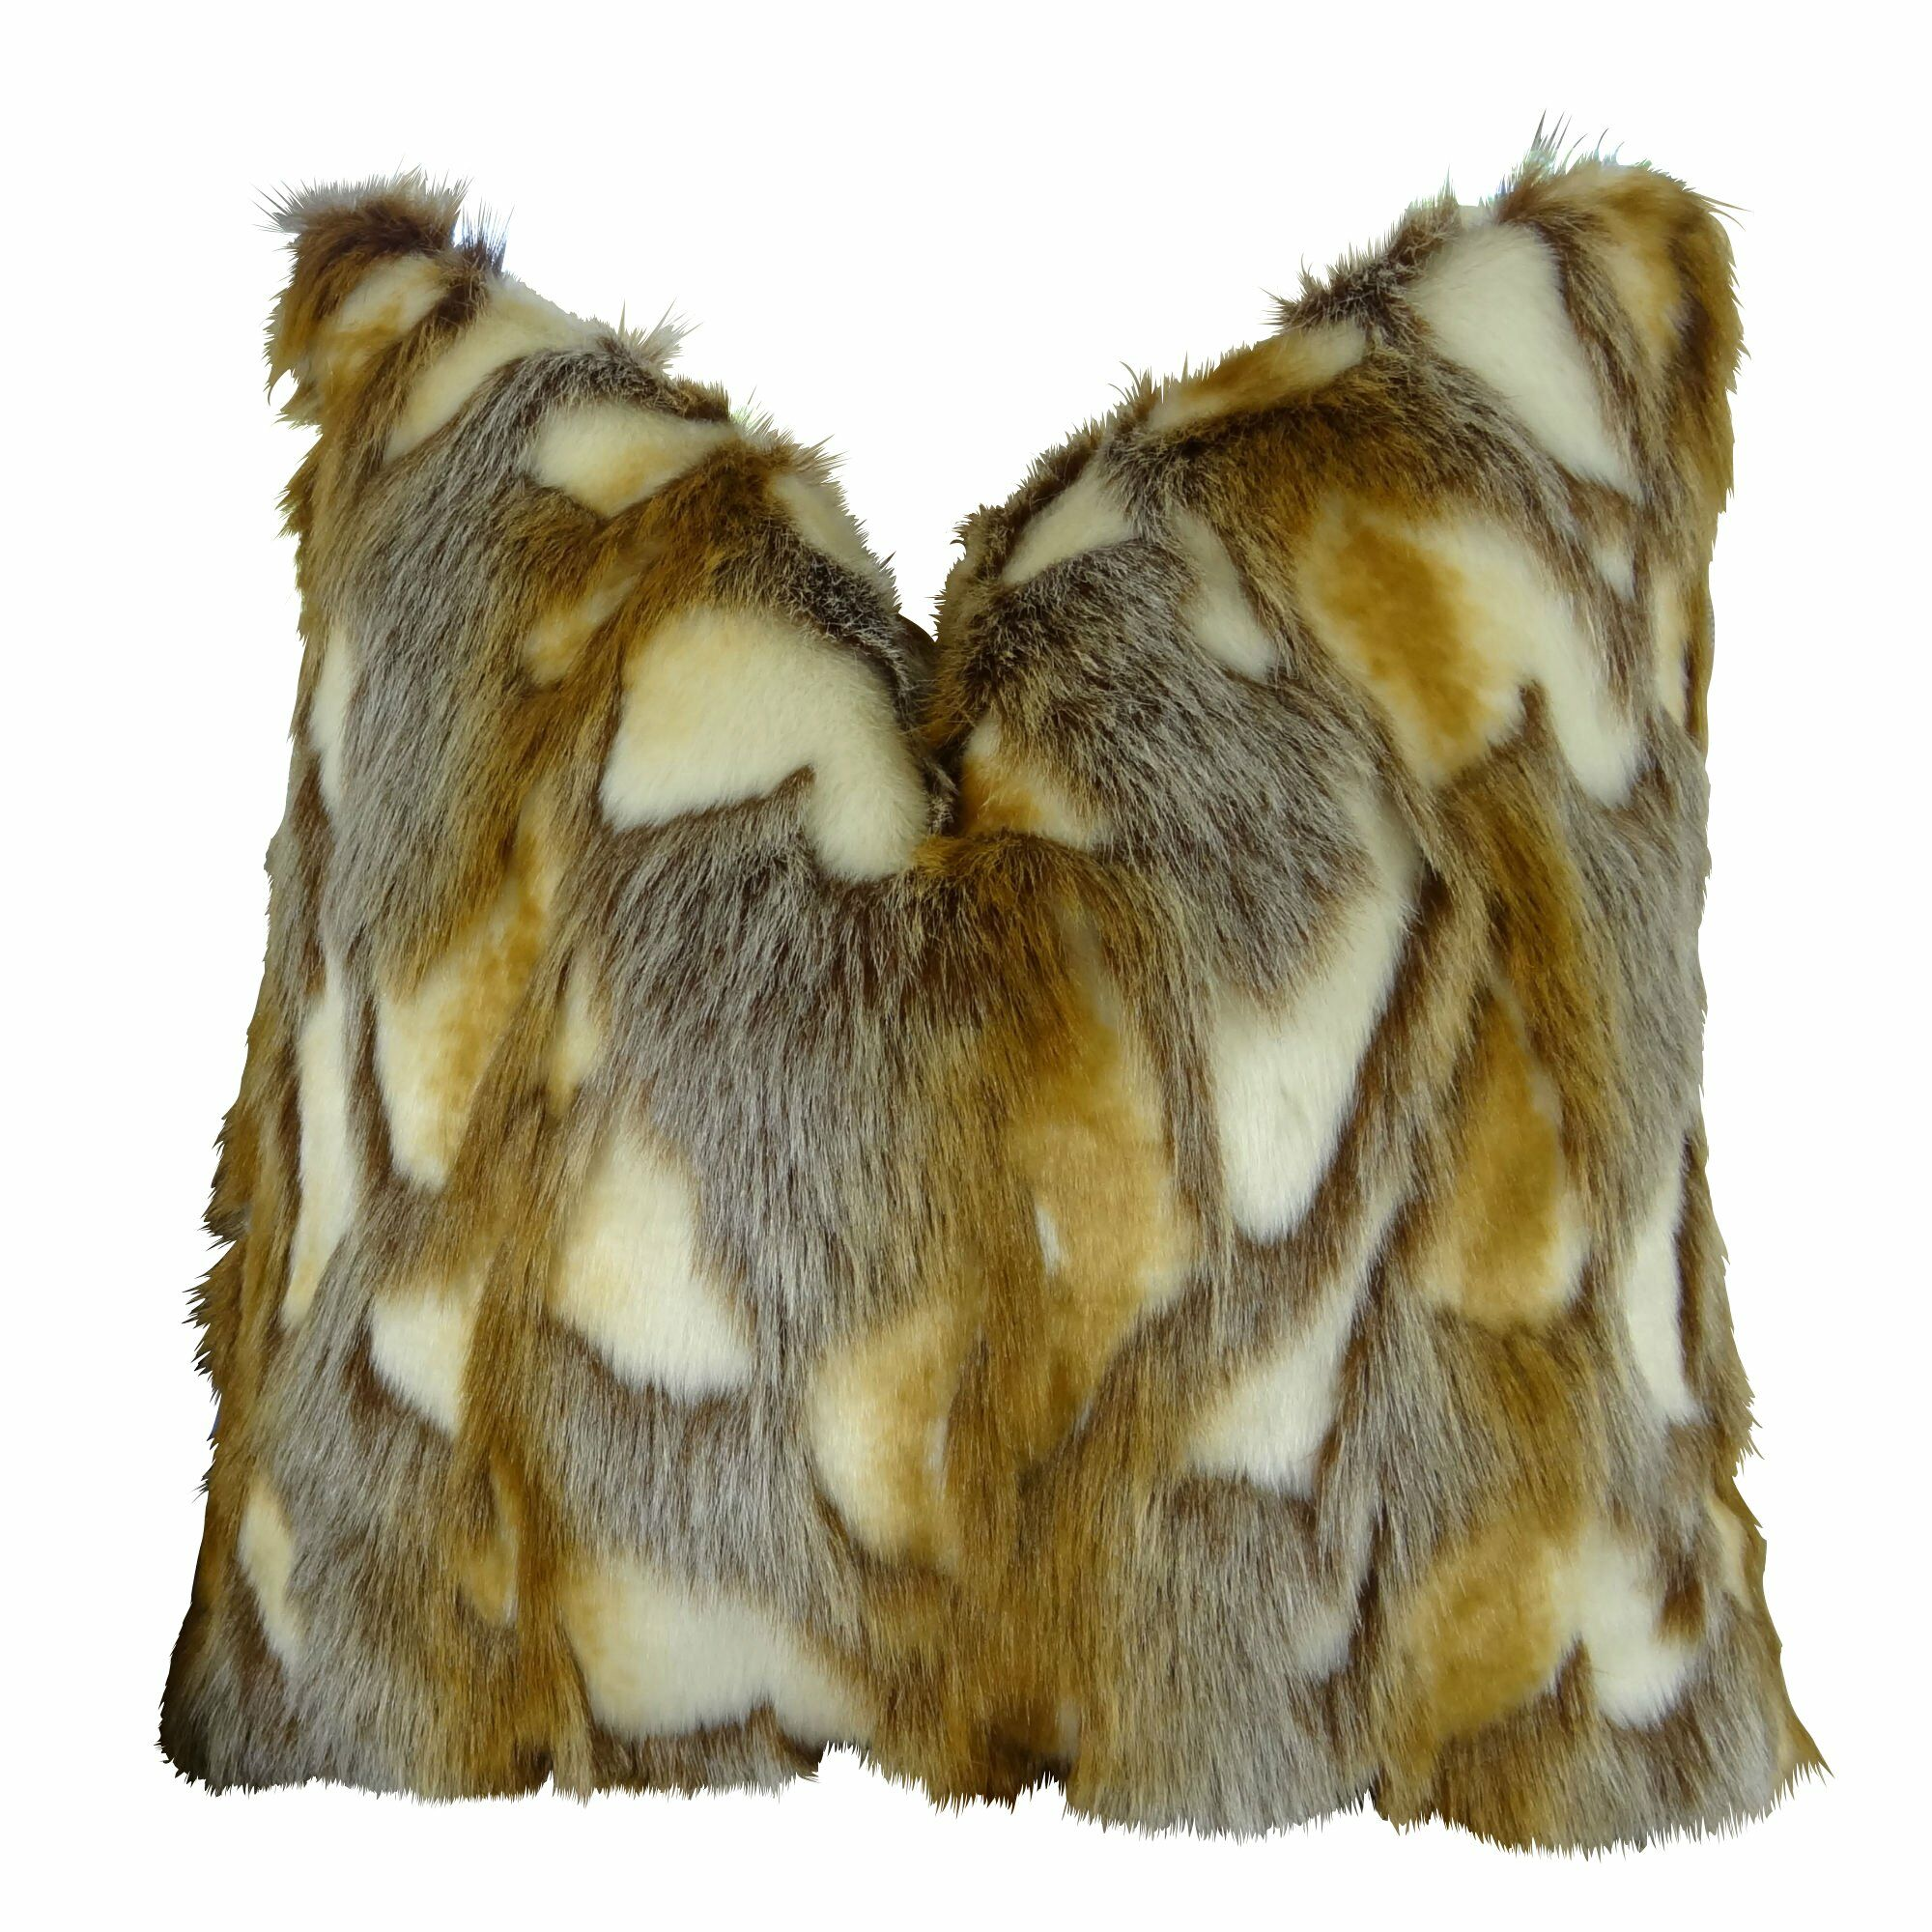 Wadlington Luxury Rabbit Faux Fur Pillow Fill Material: H-allrgnc Polyfill, Size: 16